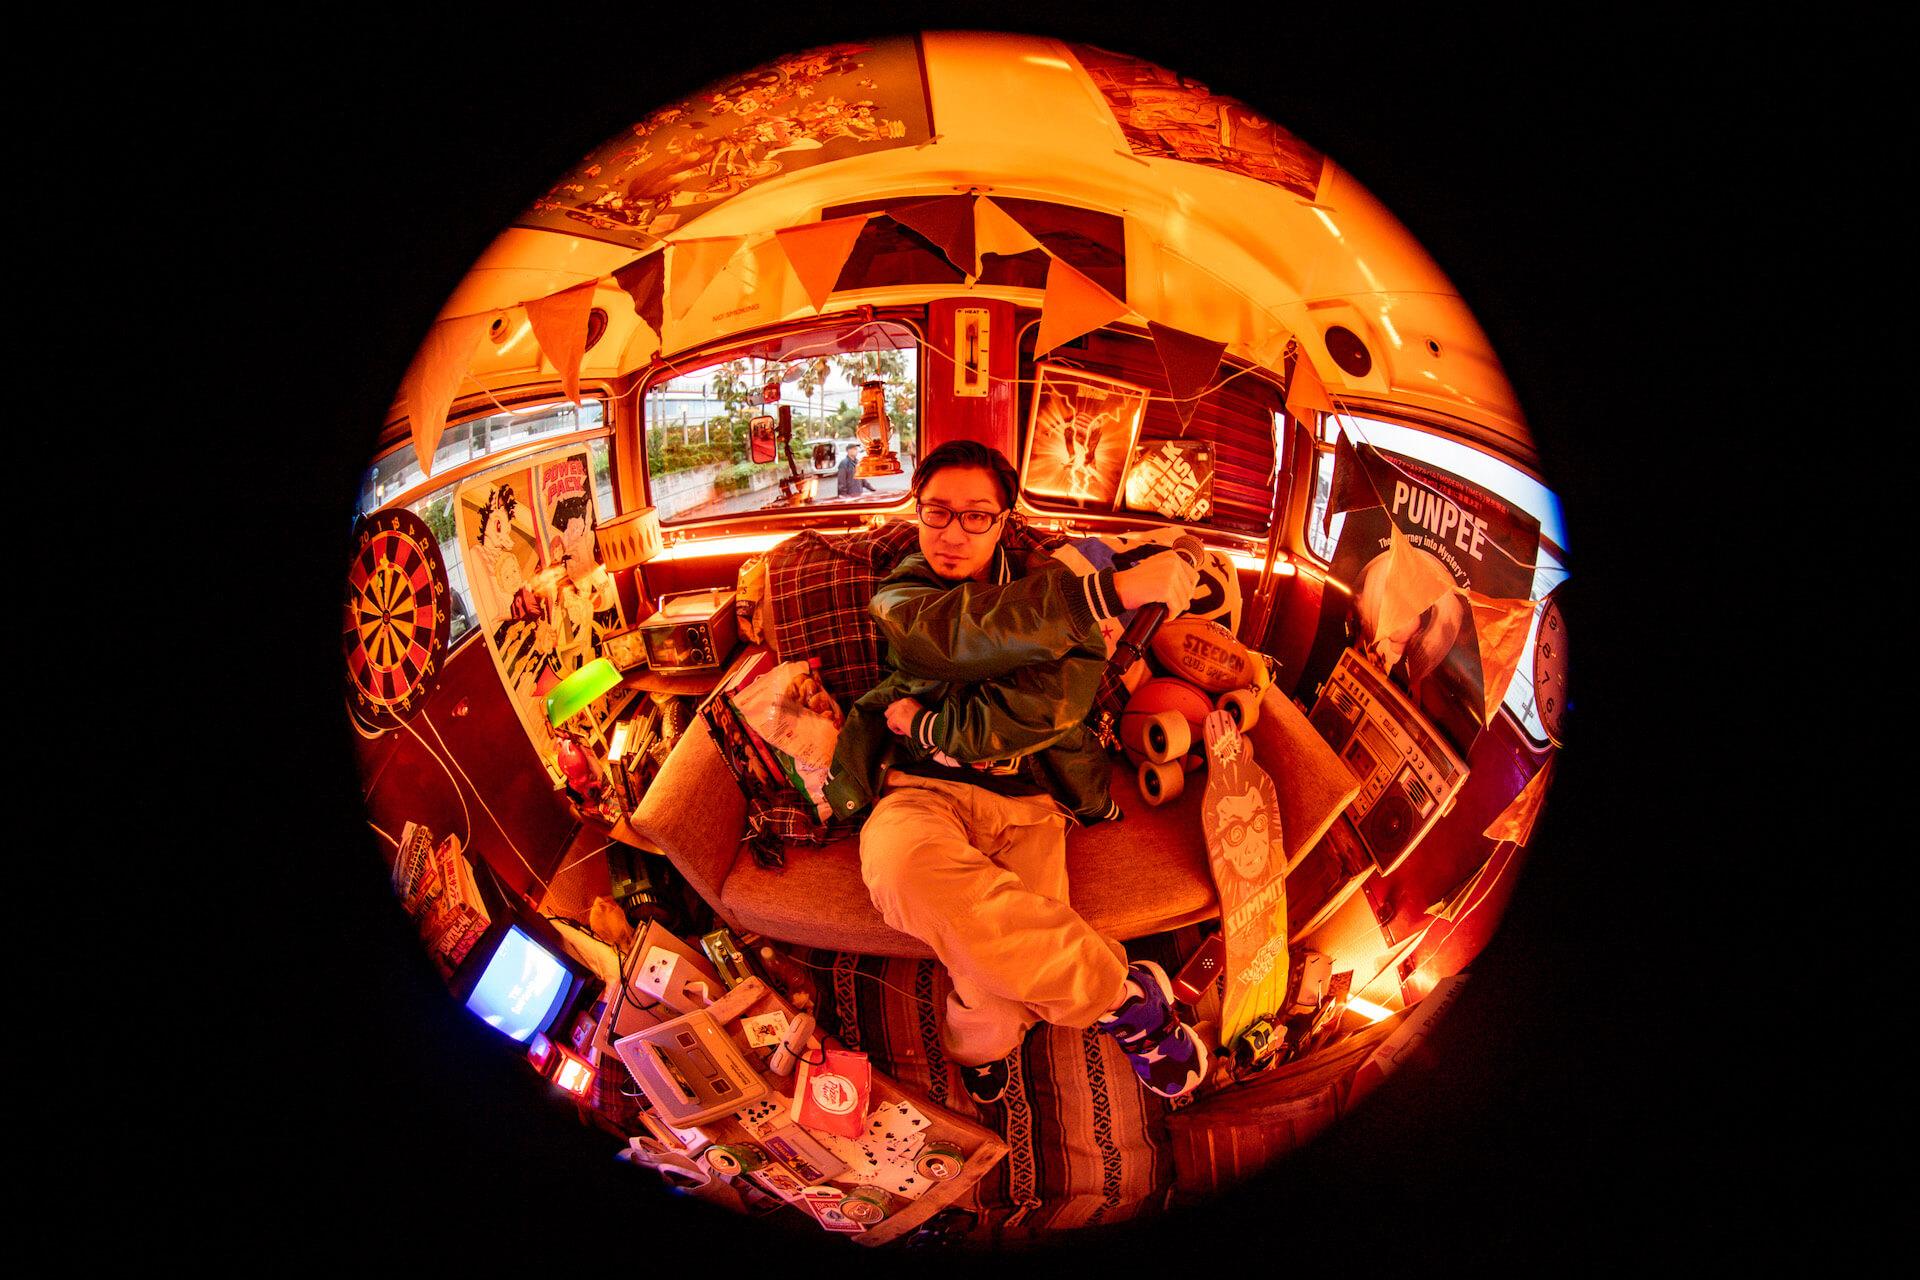 "PUNPEEによる動画配信イベント<Seasons Greetings'20>再上映決定!原島""ど真ん中""宙芳、METEORらも登場する有観客イベントも music210413_punpee_tongpoo_5"